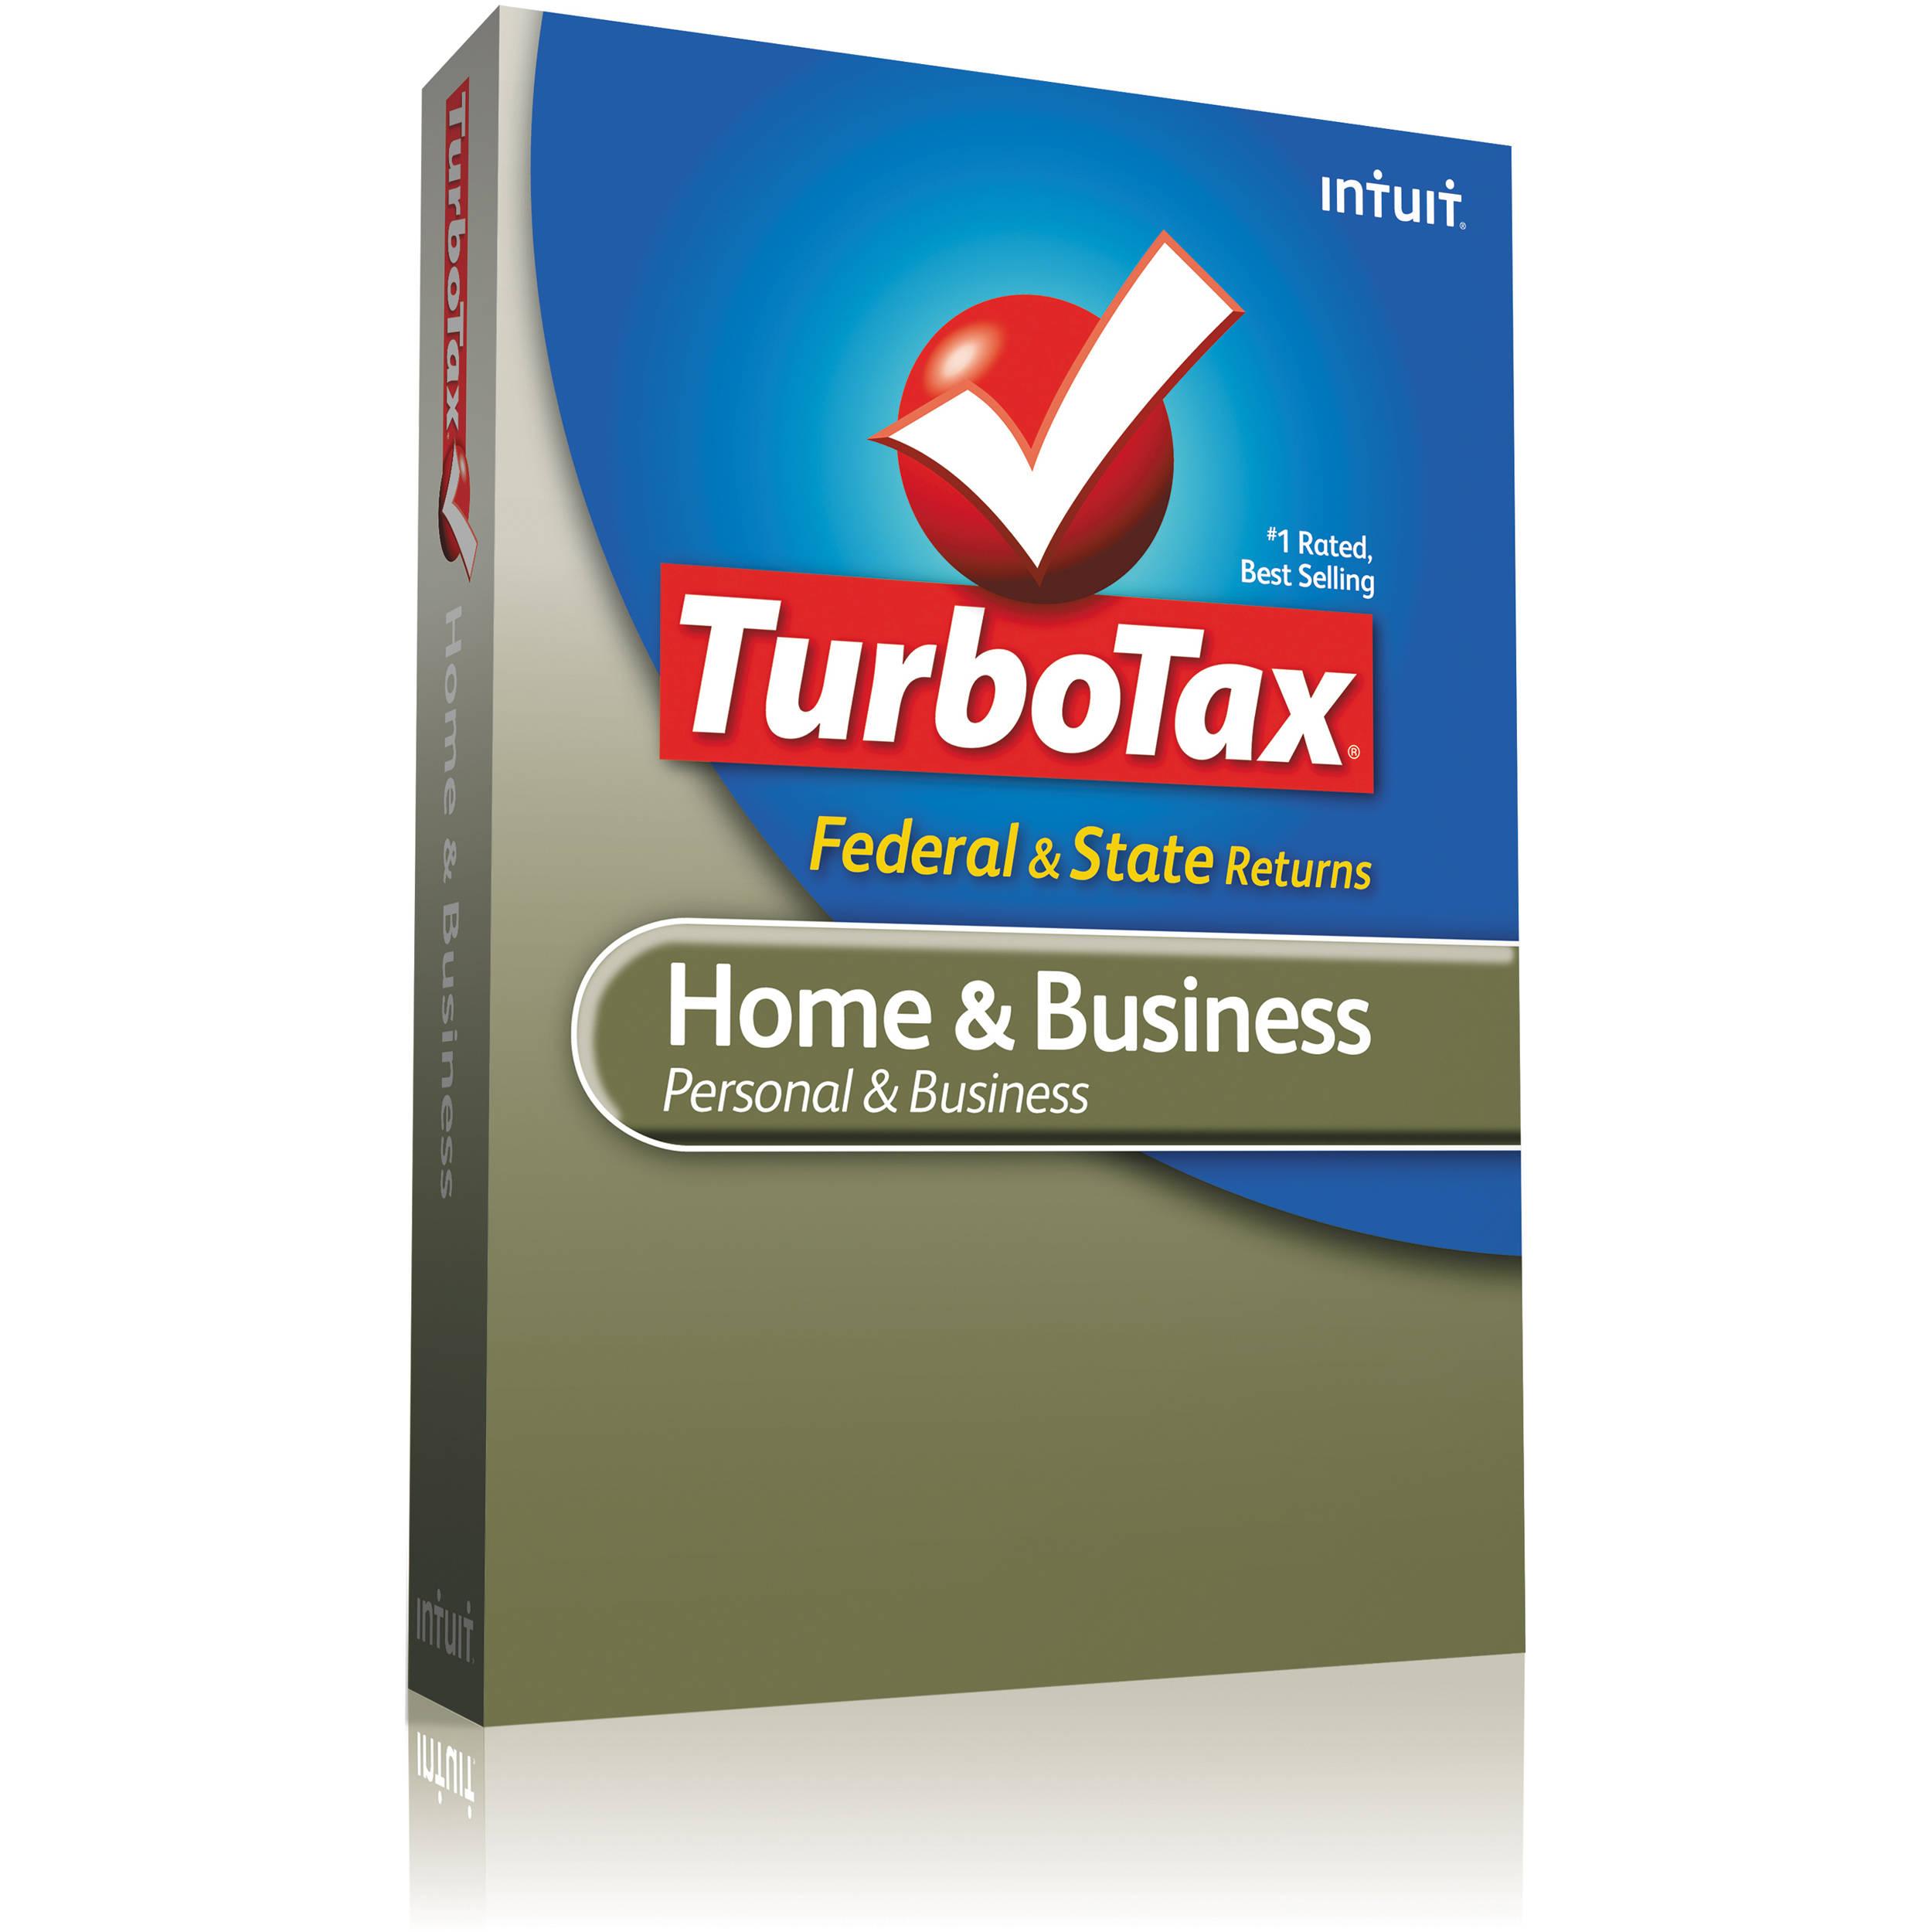 Intuit TurboTax Home & Business Plus E-File 2012 420458 B&H